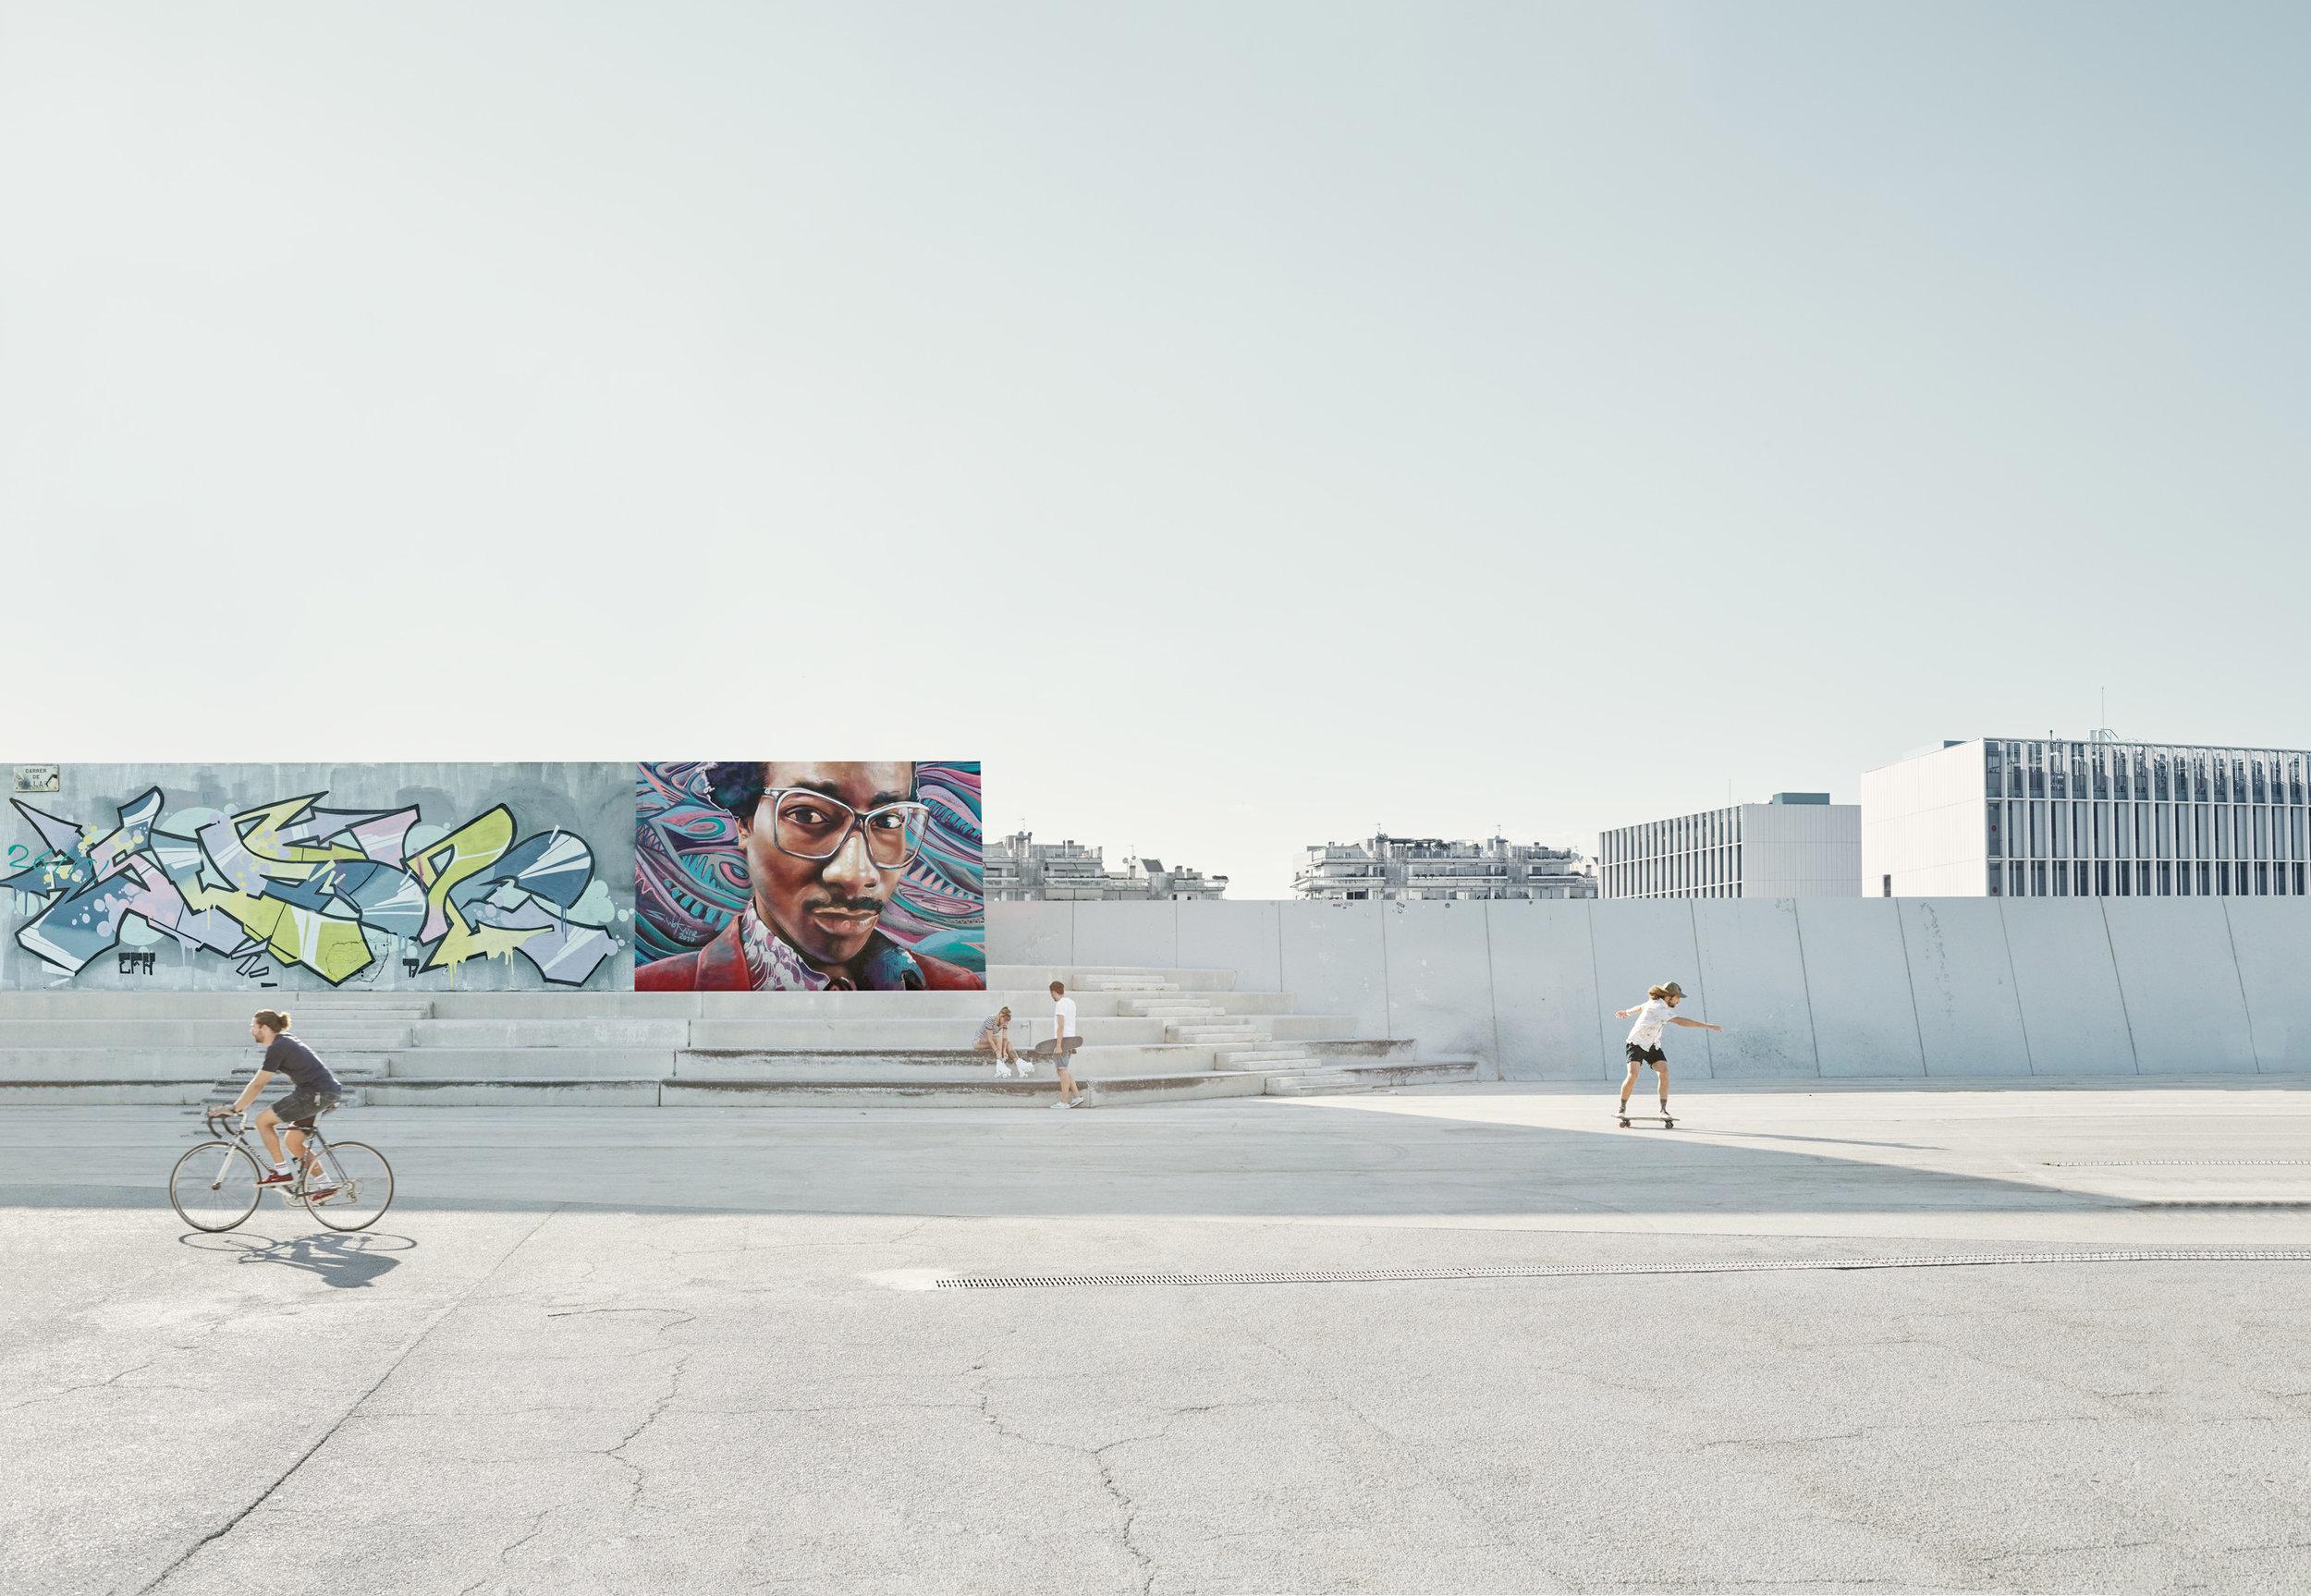 Graff-copy.jpg